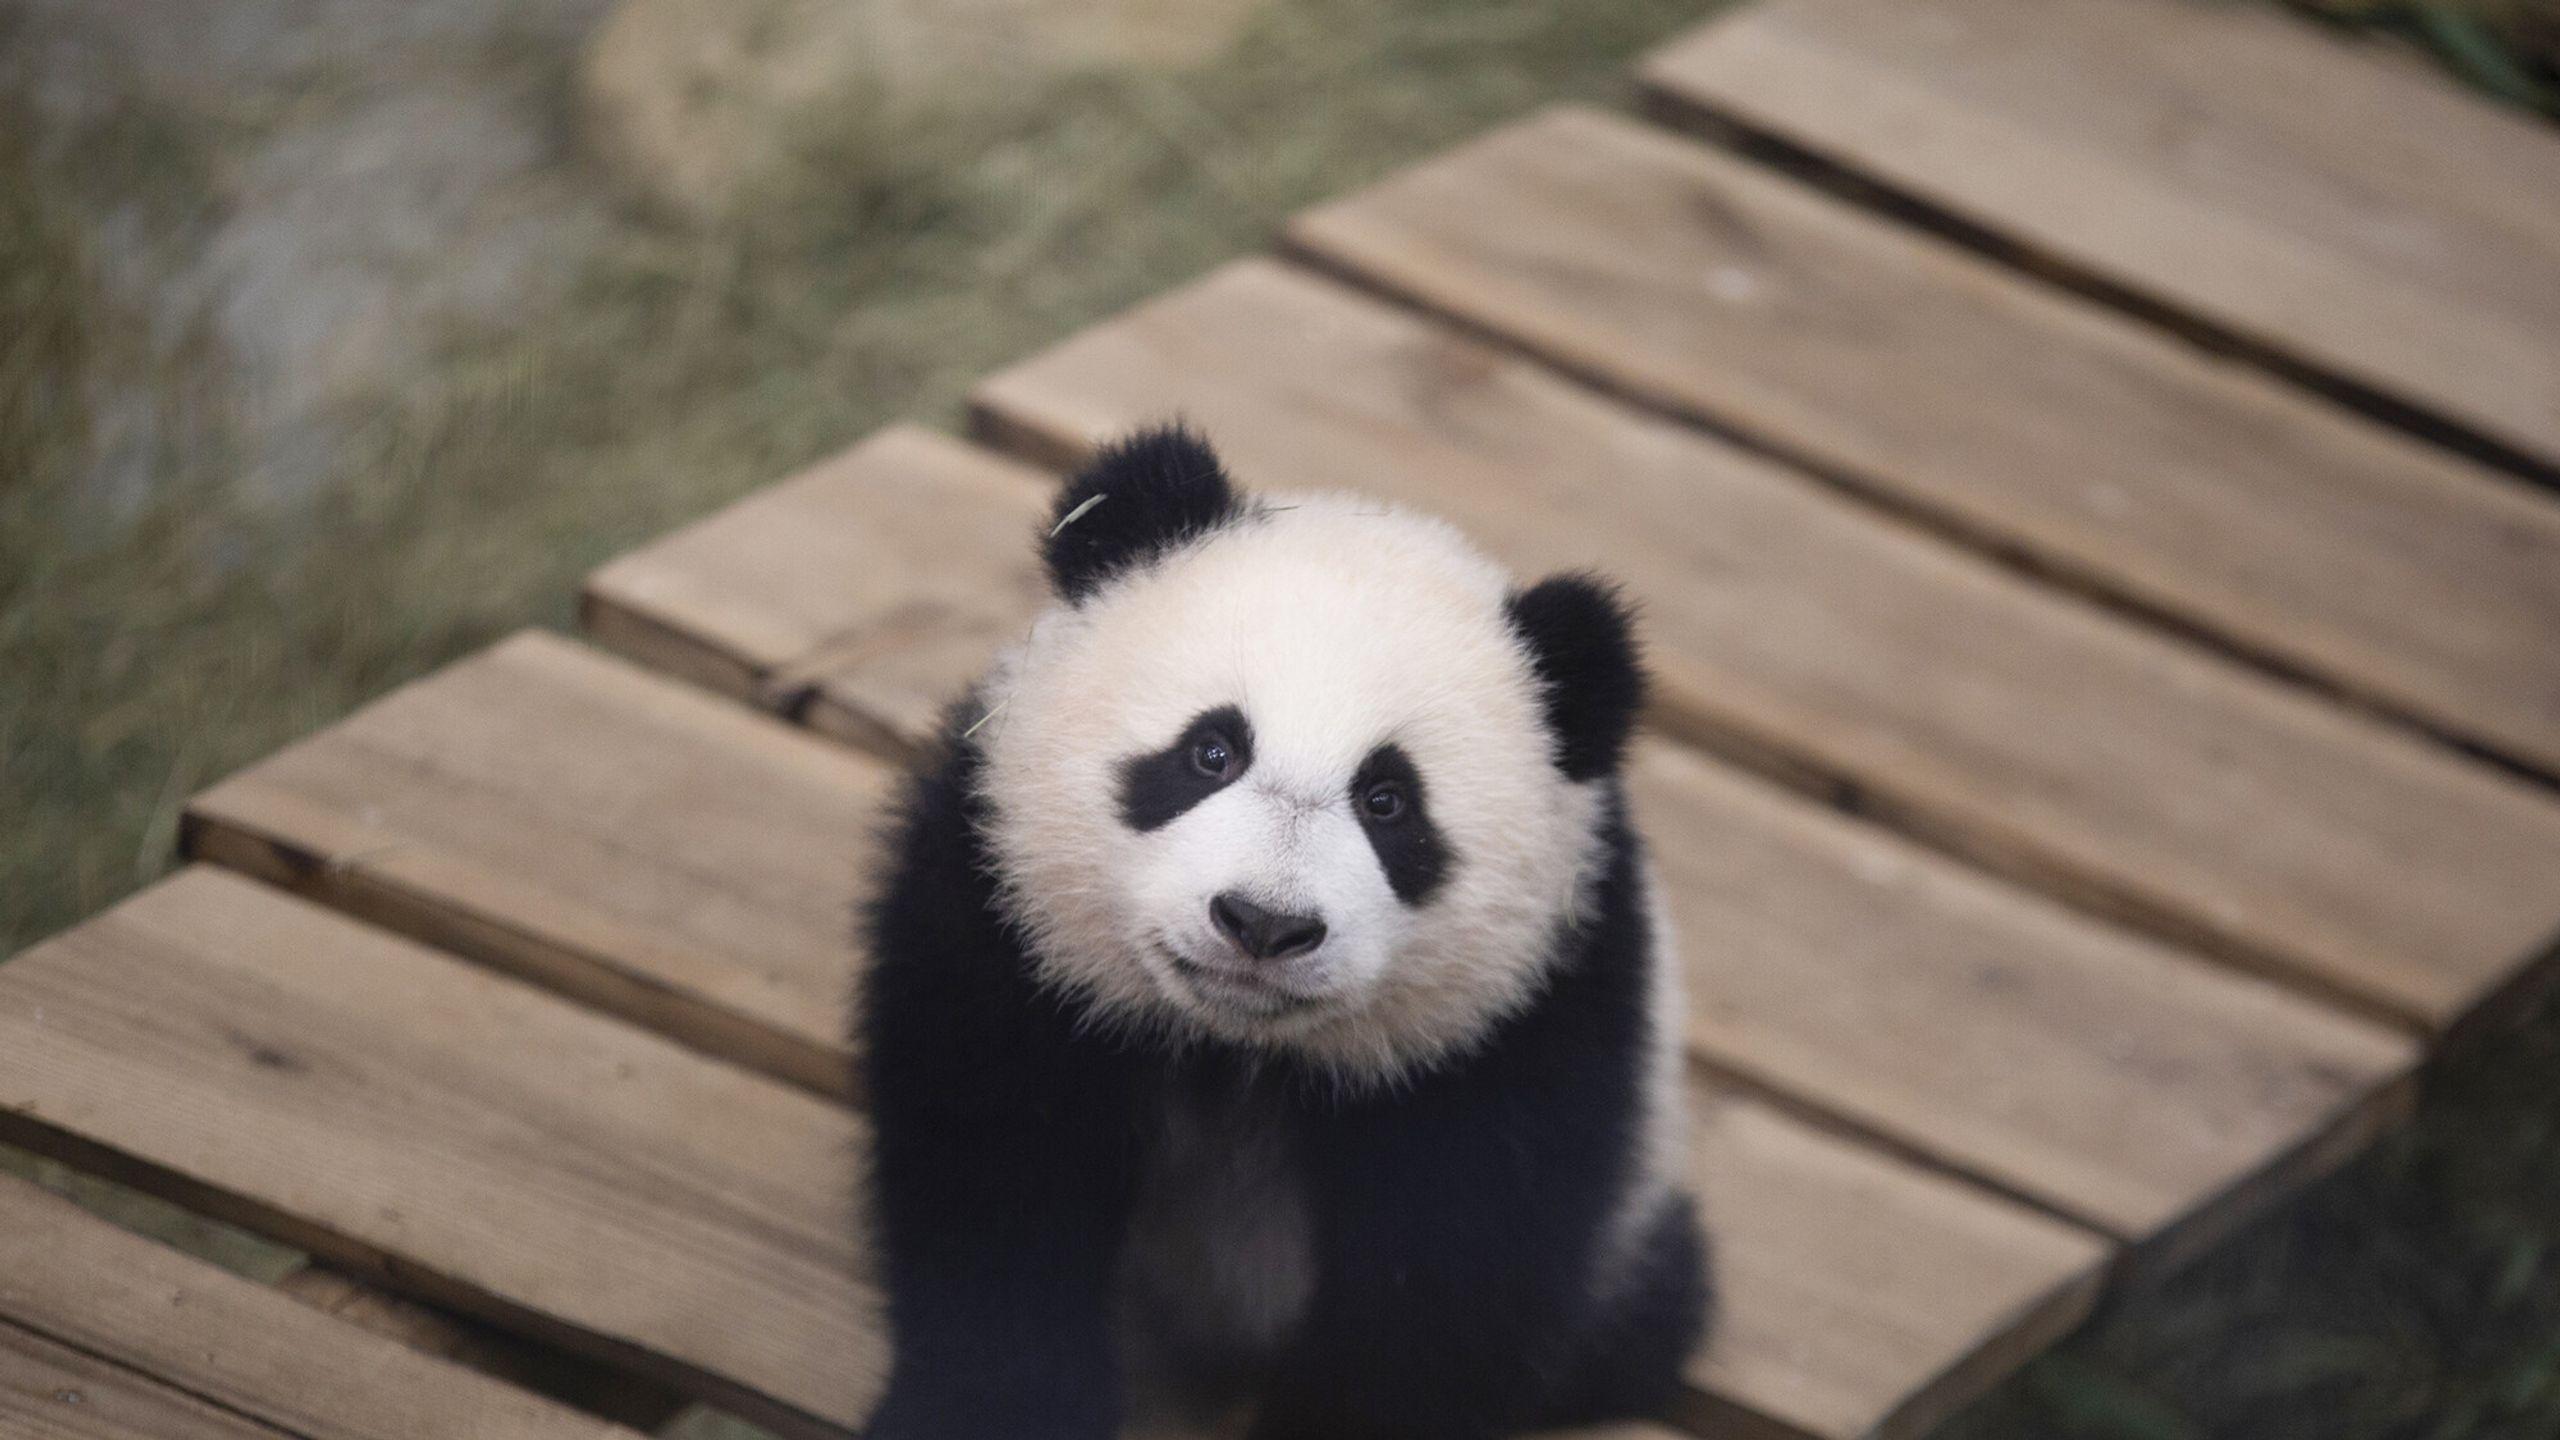 De kleine reuzenpanda